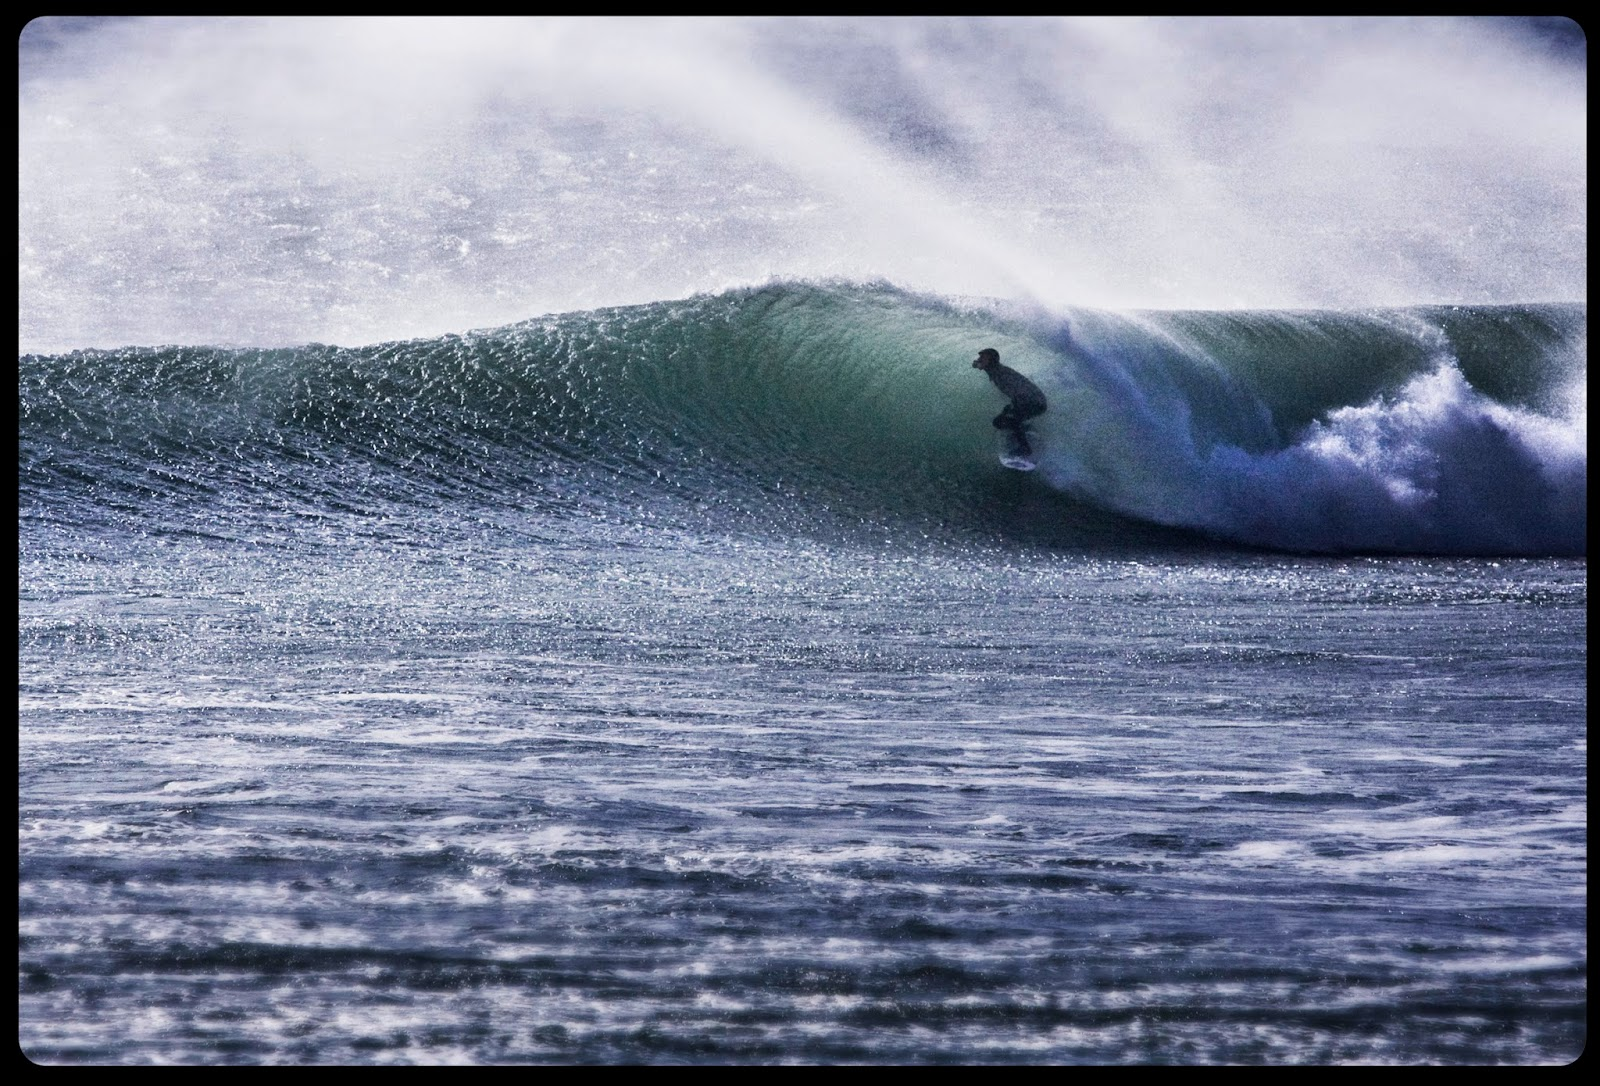 Surfing, Barrel, Porthleven, Cornwall